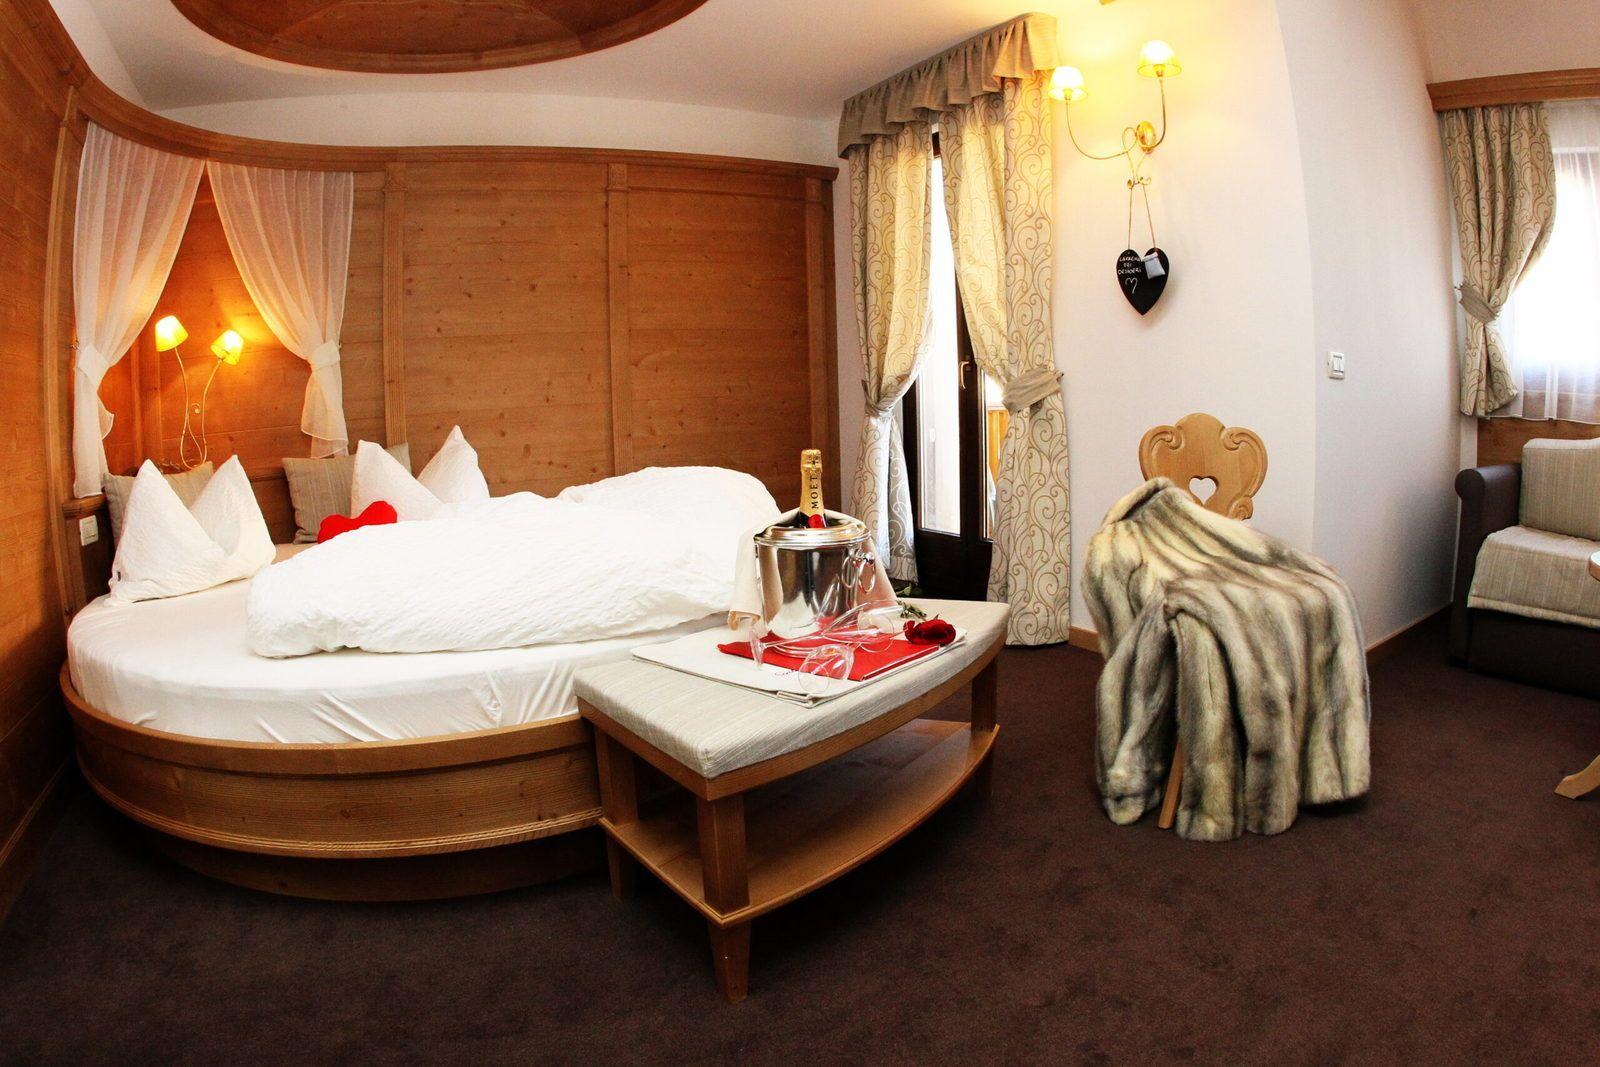 Cavallino Lovely Hotel le junior suites ad Andalo